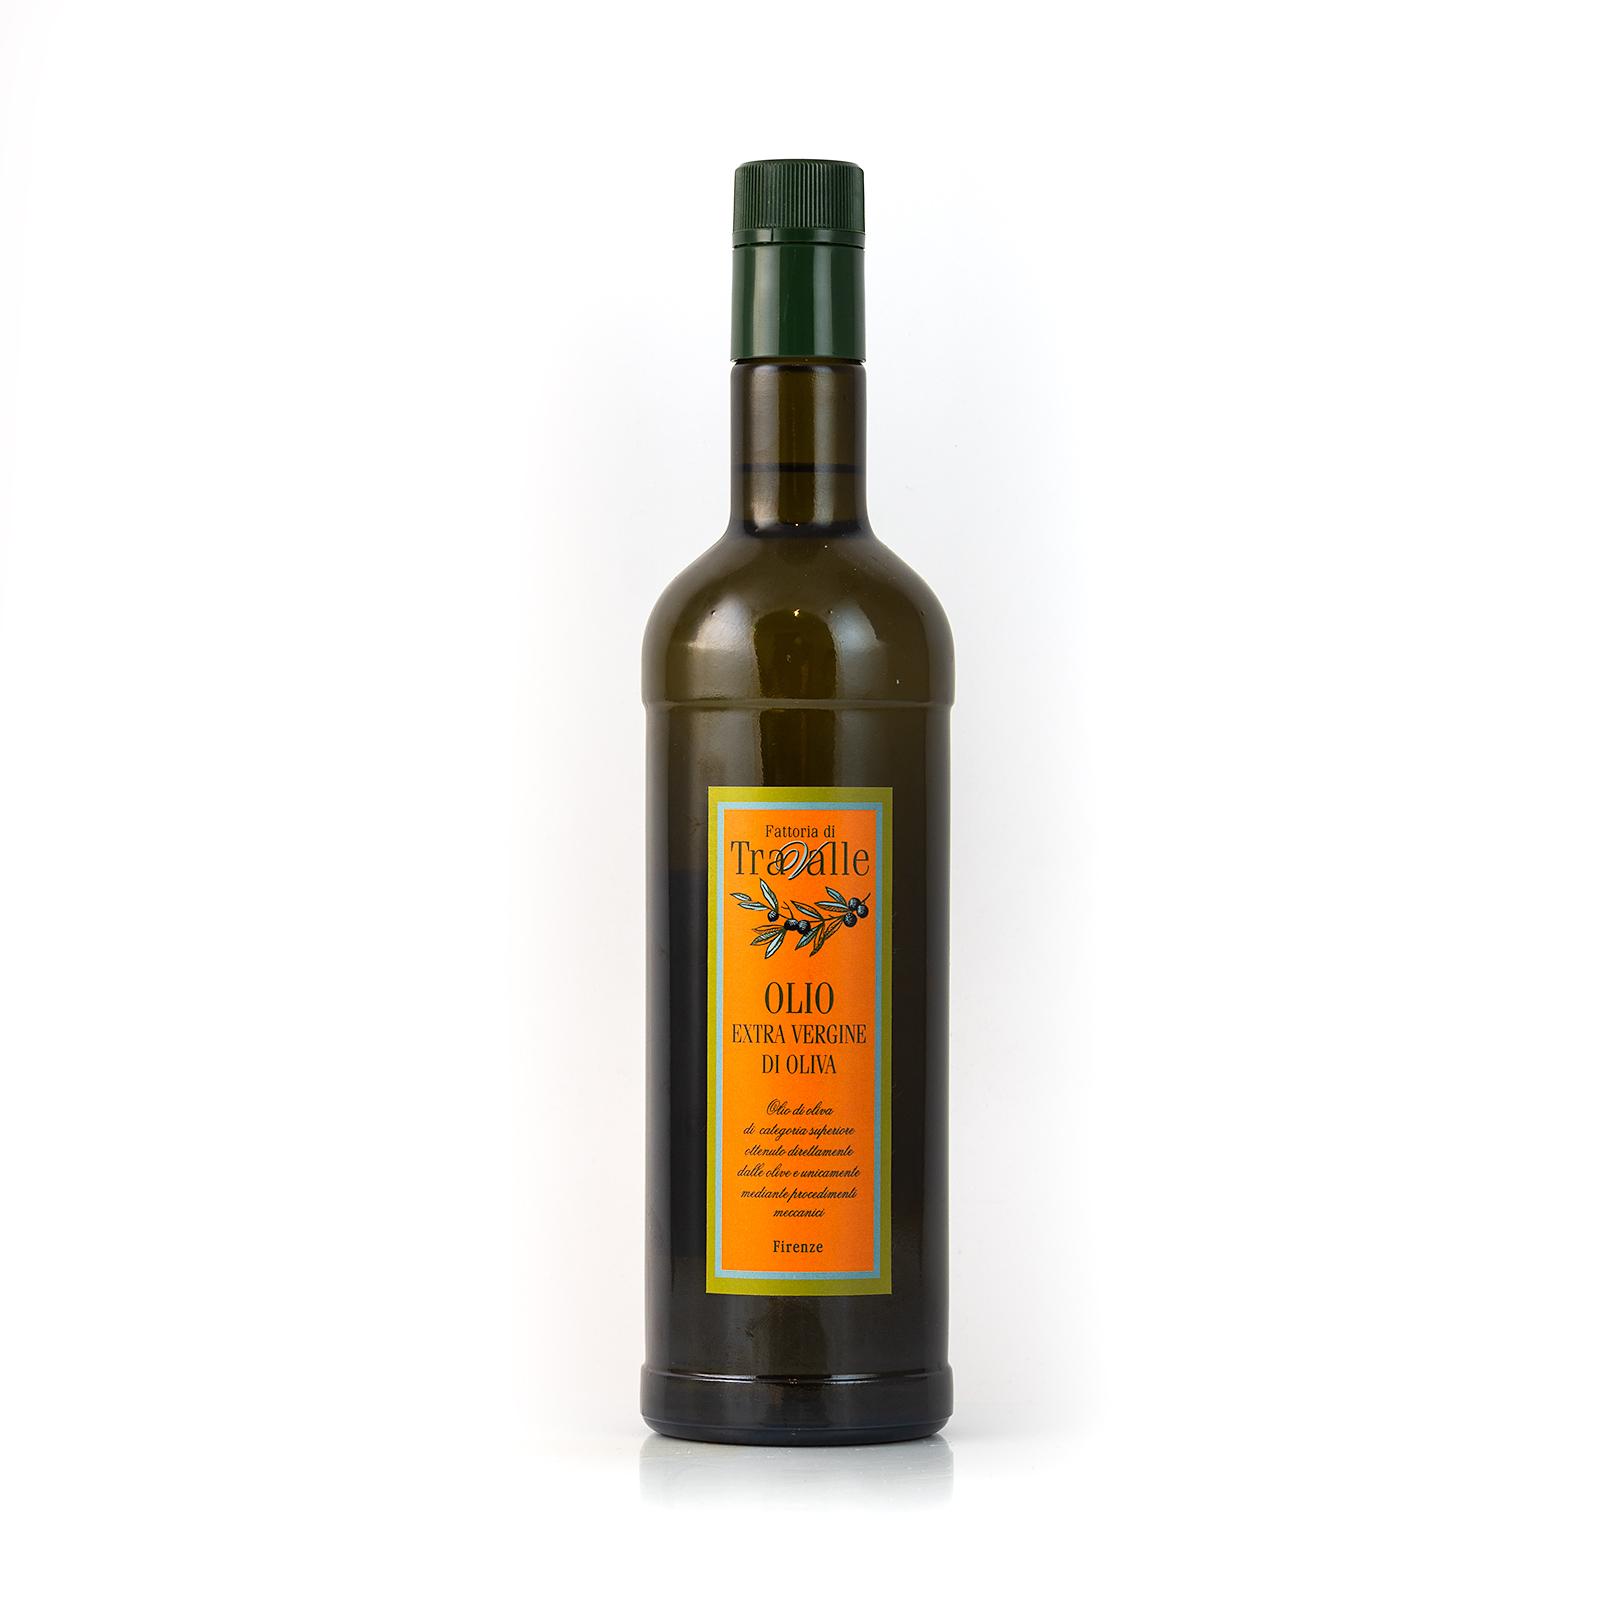 Fattoria di Travalle Olio Extra Vergine di Oliva Travalle - 0,75l